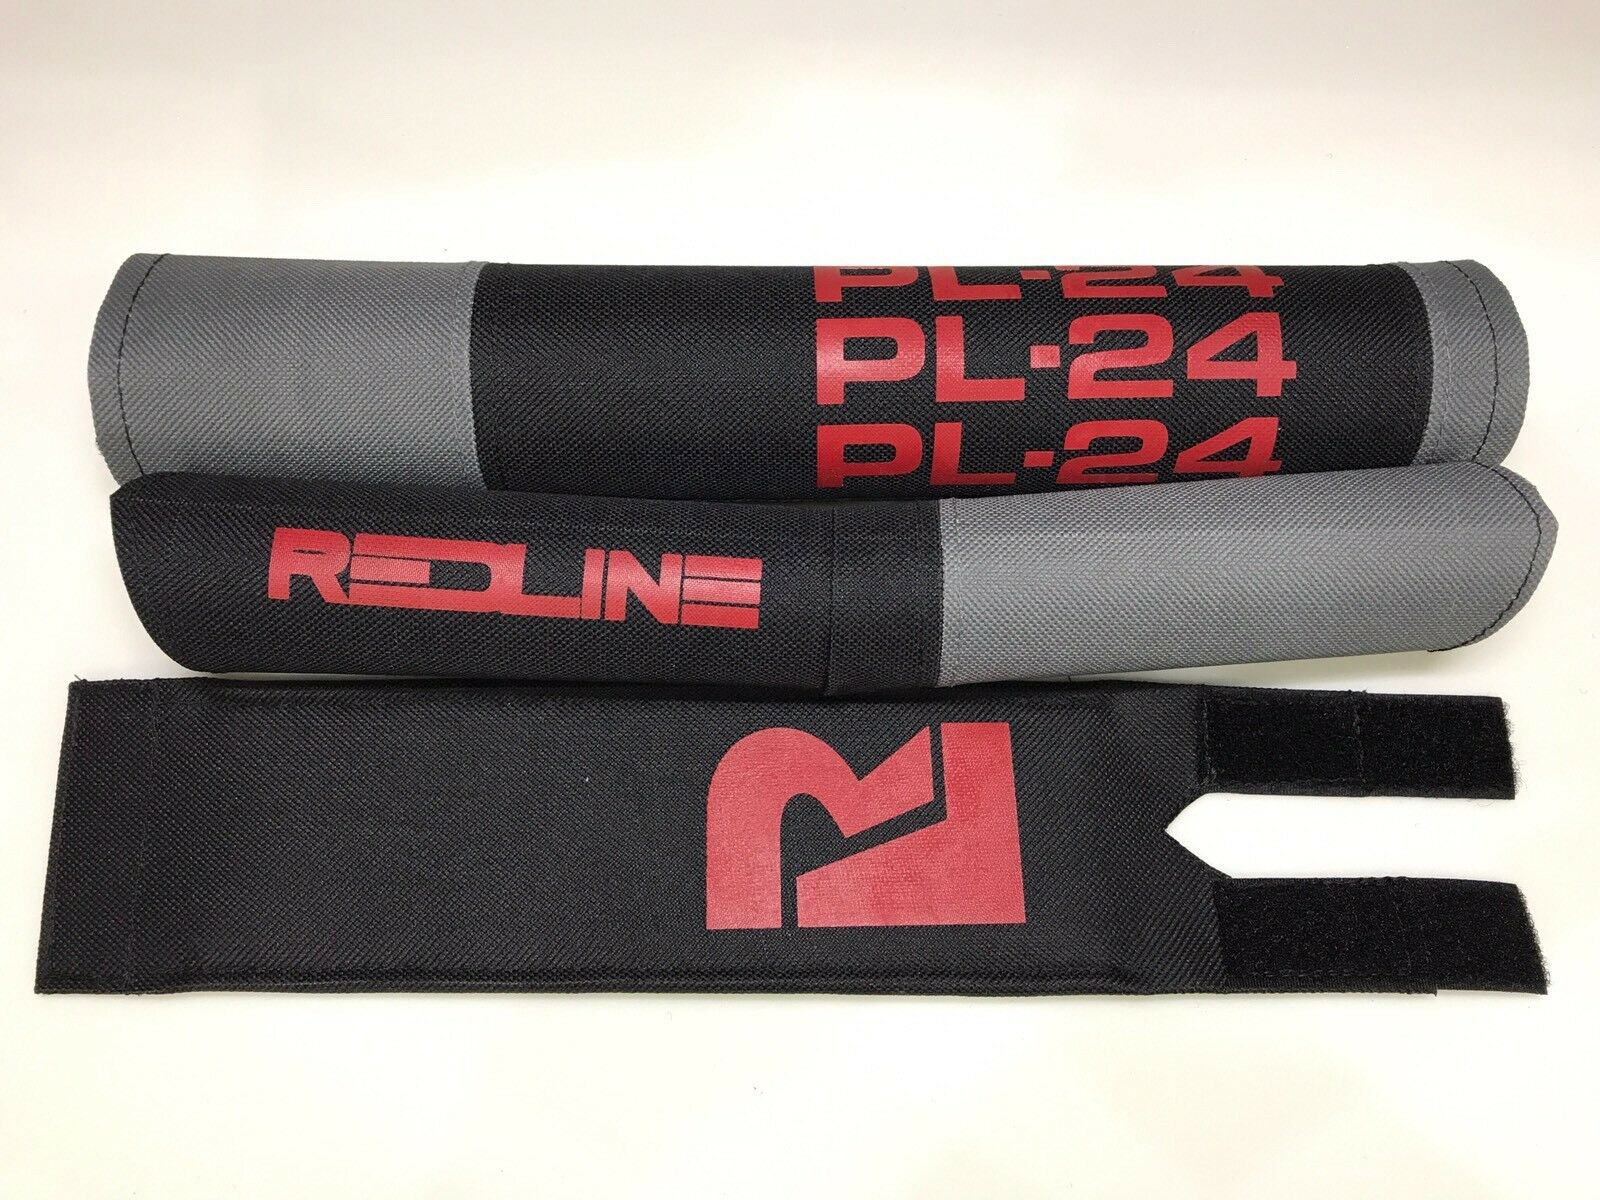 Rossoline Proline Proline Proline PL-24 BMX OLDSCHOOL PAD SET V Handlebar Style dbf642